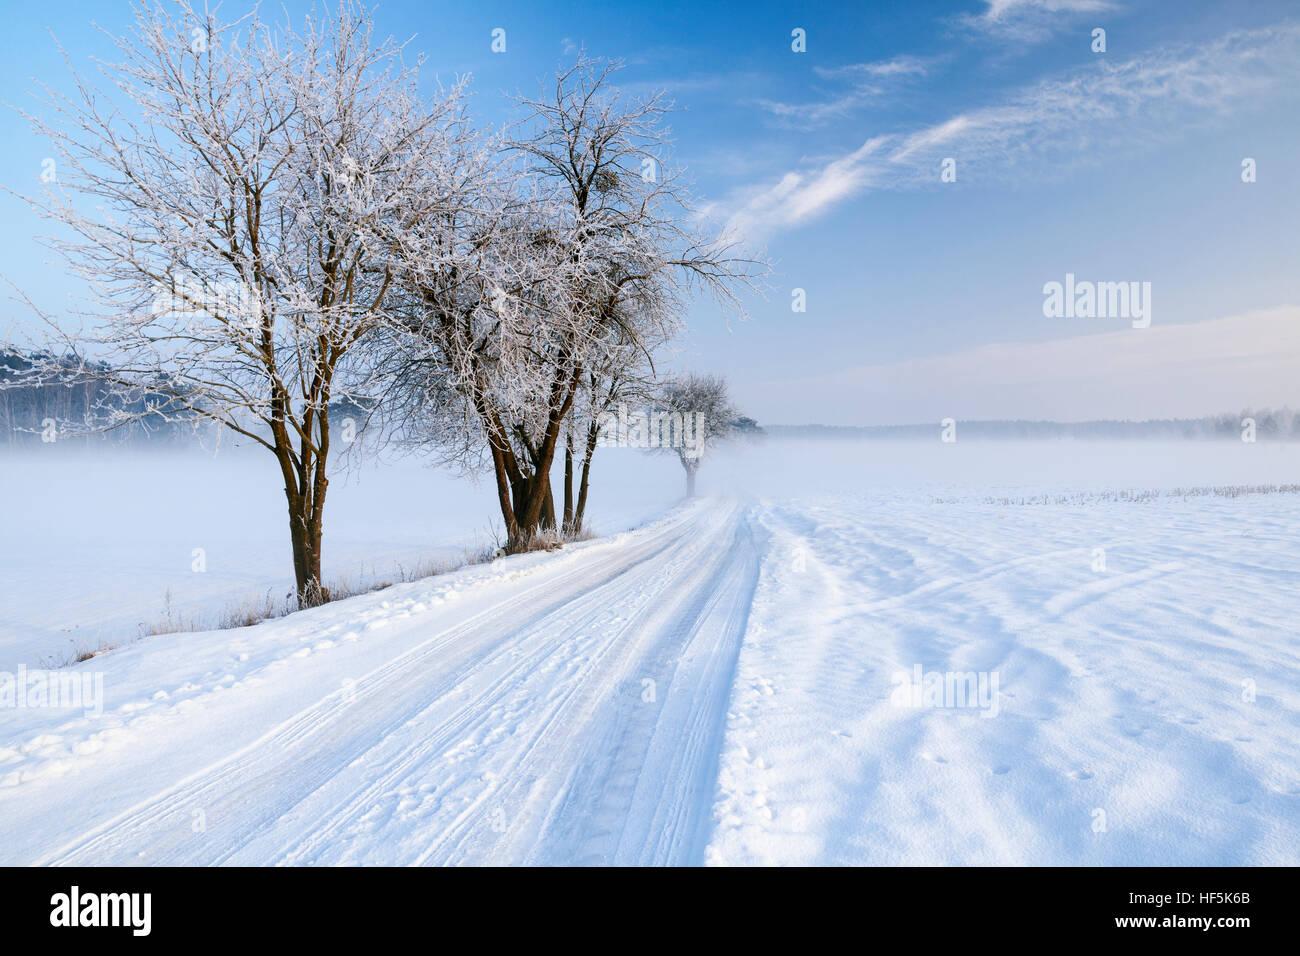 Masuria road in snowy winter, Poland, Europe. Stock Photo